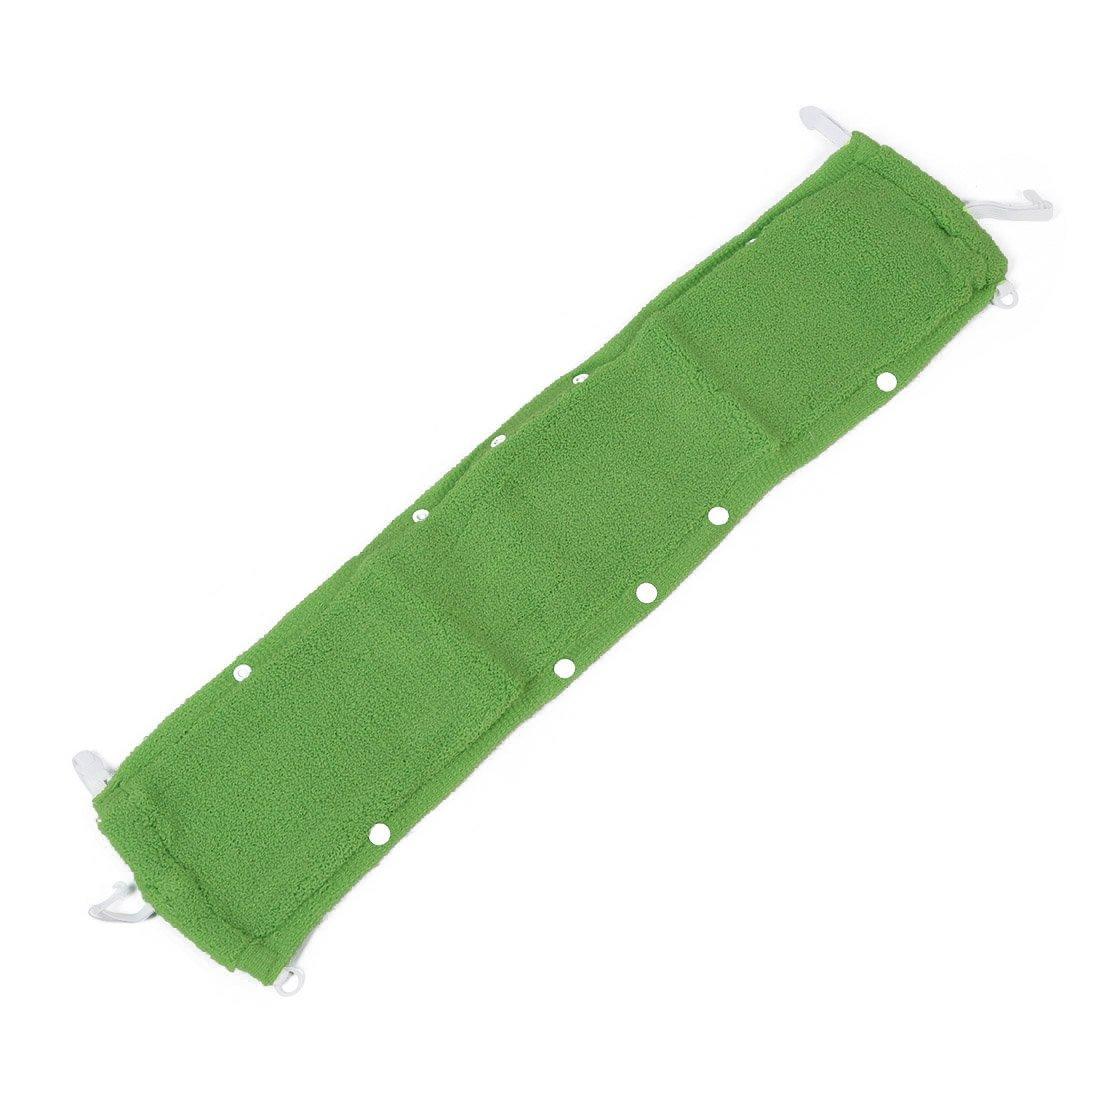 SODIAL(R) Washroom Reusable Warmer Soft Toilet Seat Cover Mat Pad Cushion Green AEQW-WER-AW133836